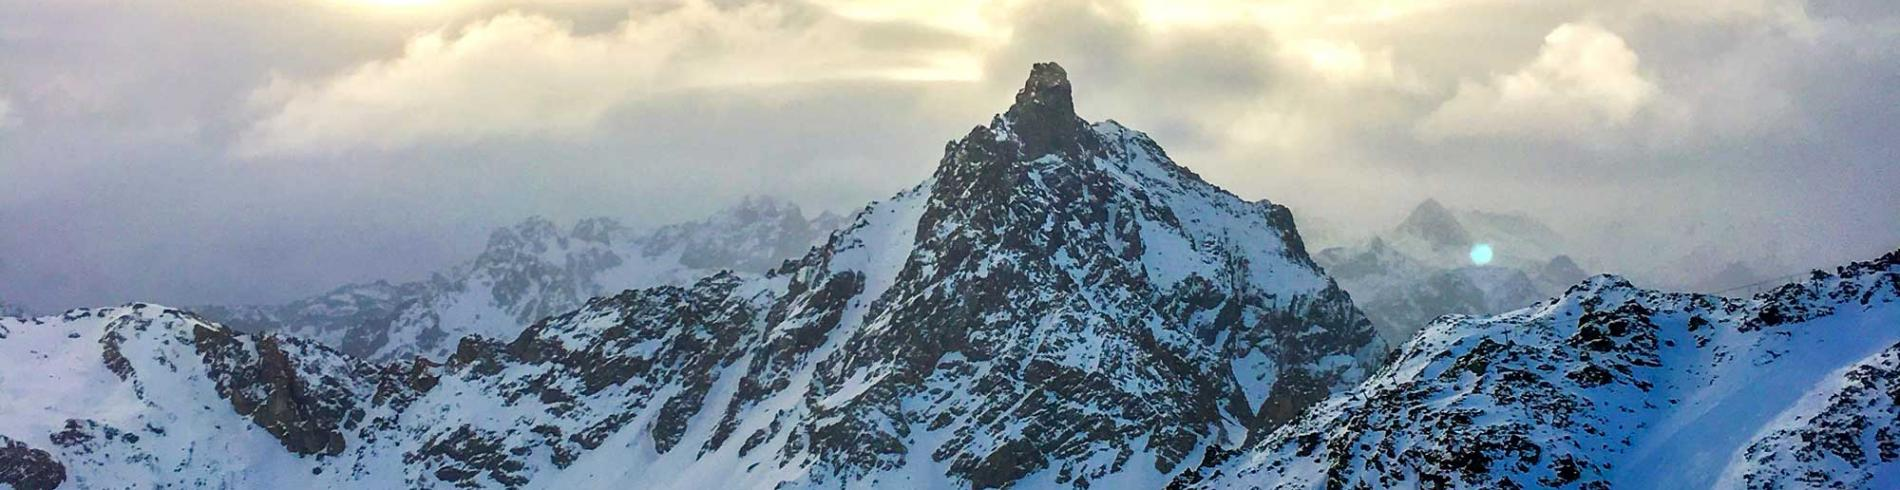 Mountain shot of Courchevel